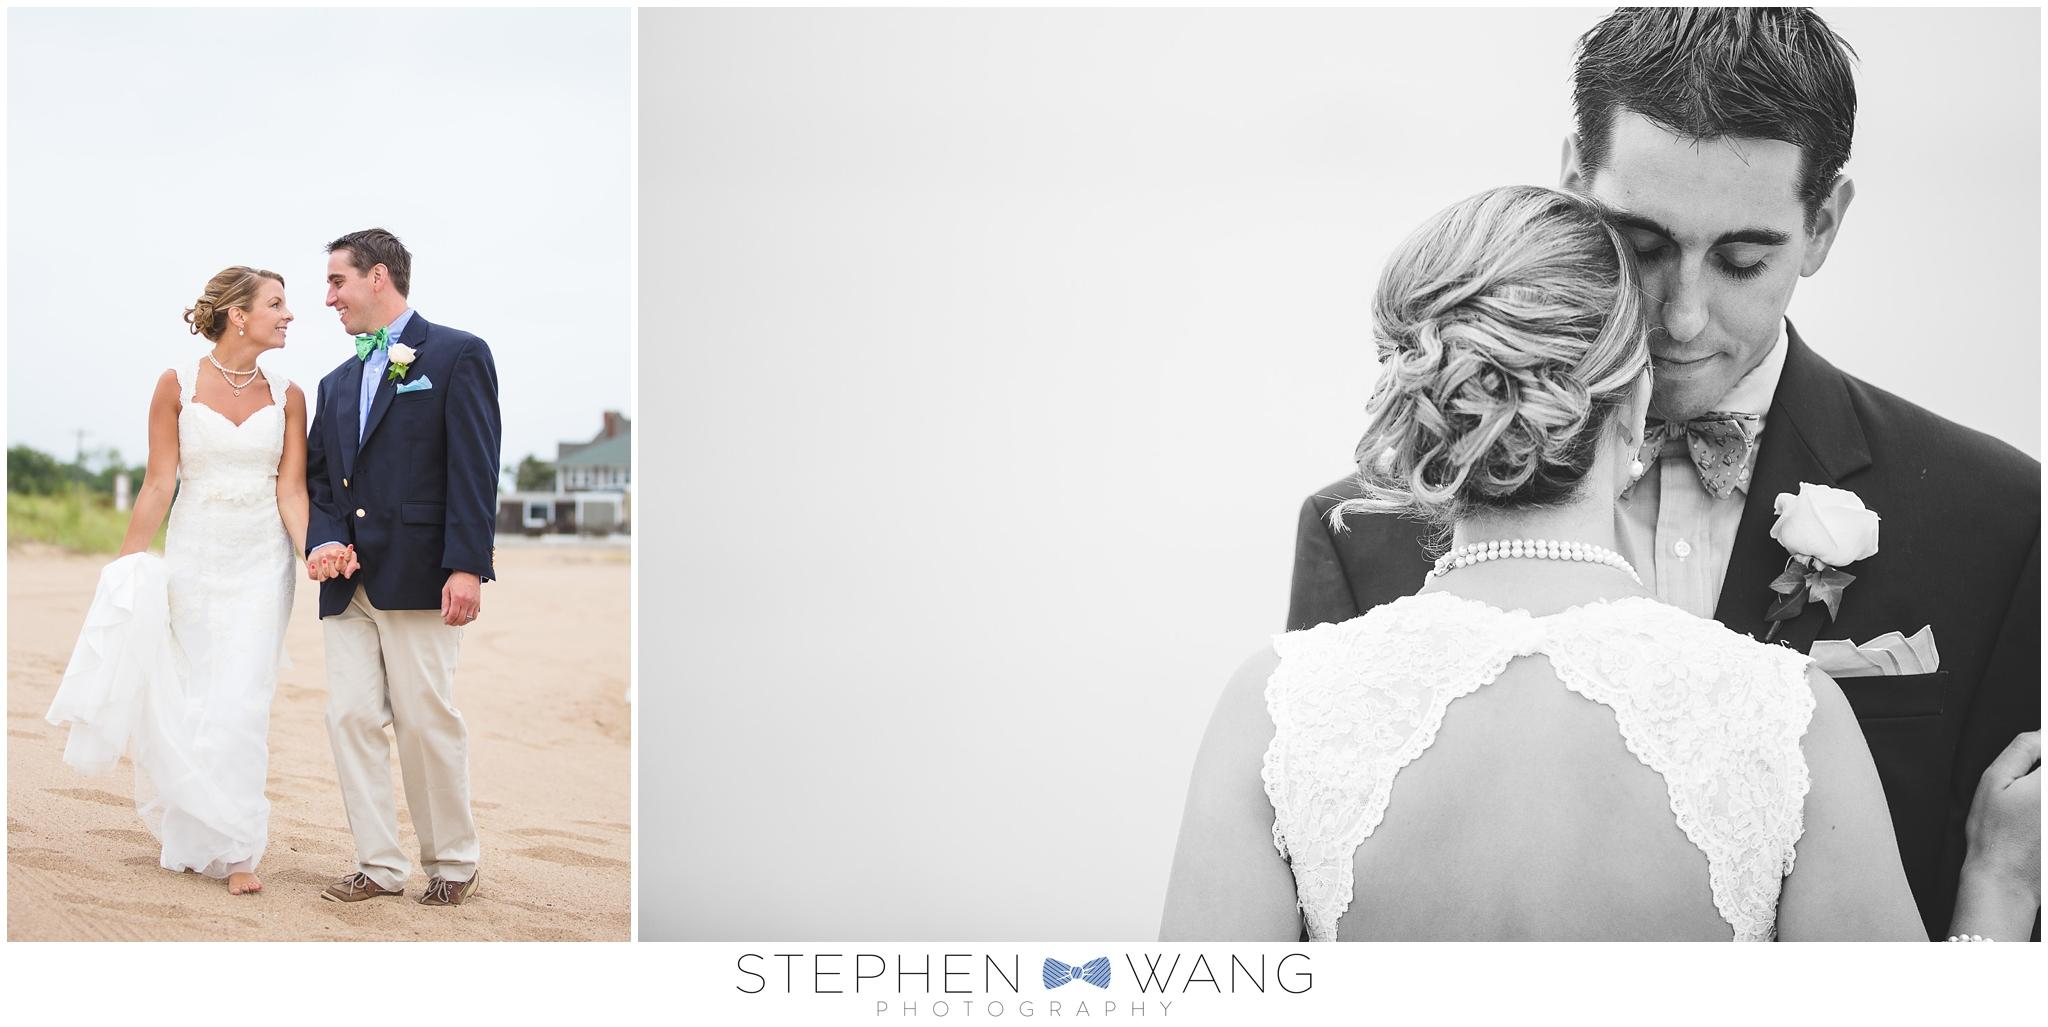 Stephen Wang Photography Madison Surf Club Wedding Photogrpahy CT Connecticut Shoreline Beach Summer Sunset -08-12_0019.jpg